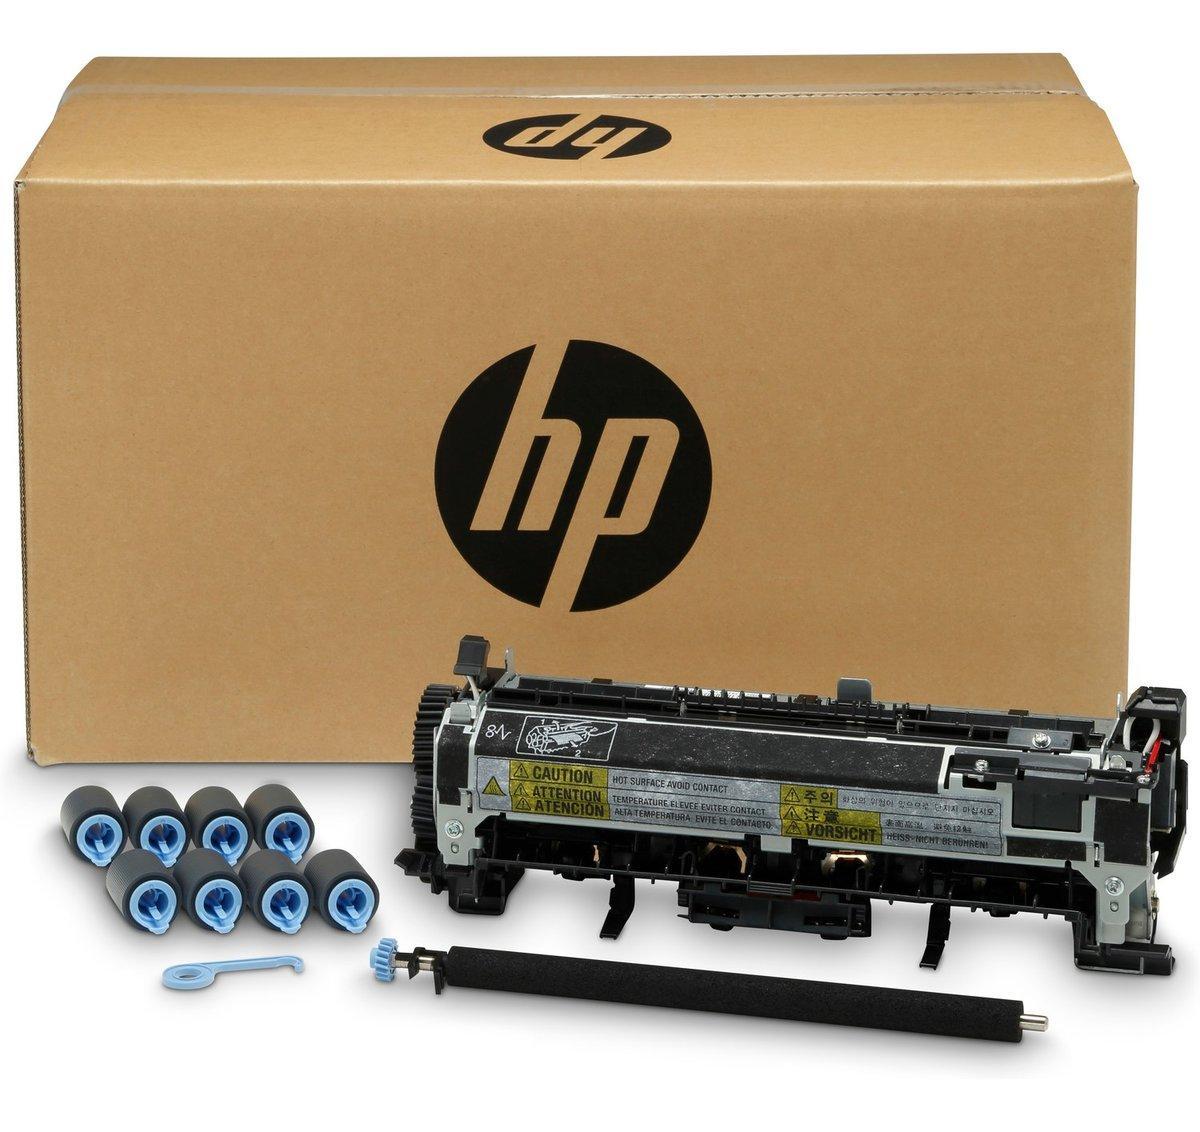 HP B3M78A Комплект для обслуживания HP LaserJet, 220 В, для Color LaserJet Enterprise M630